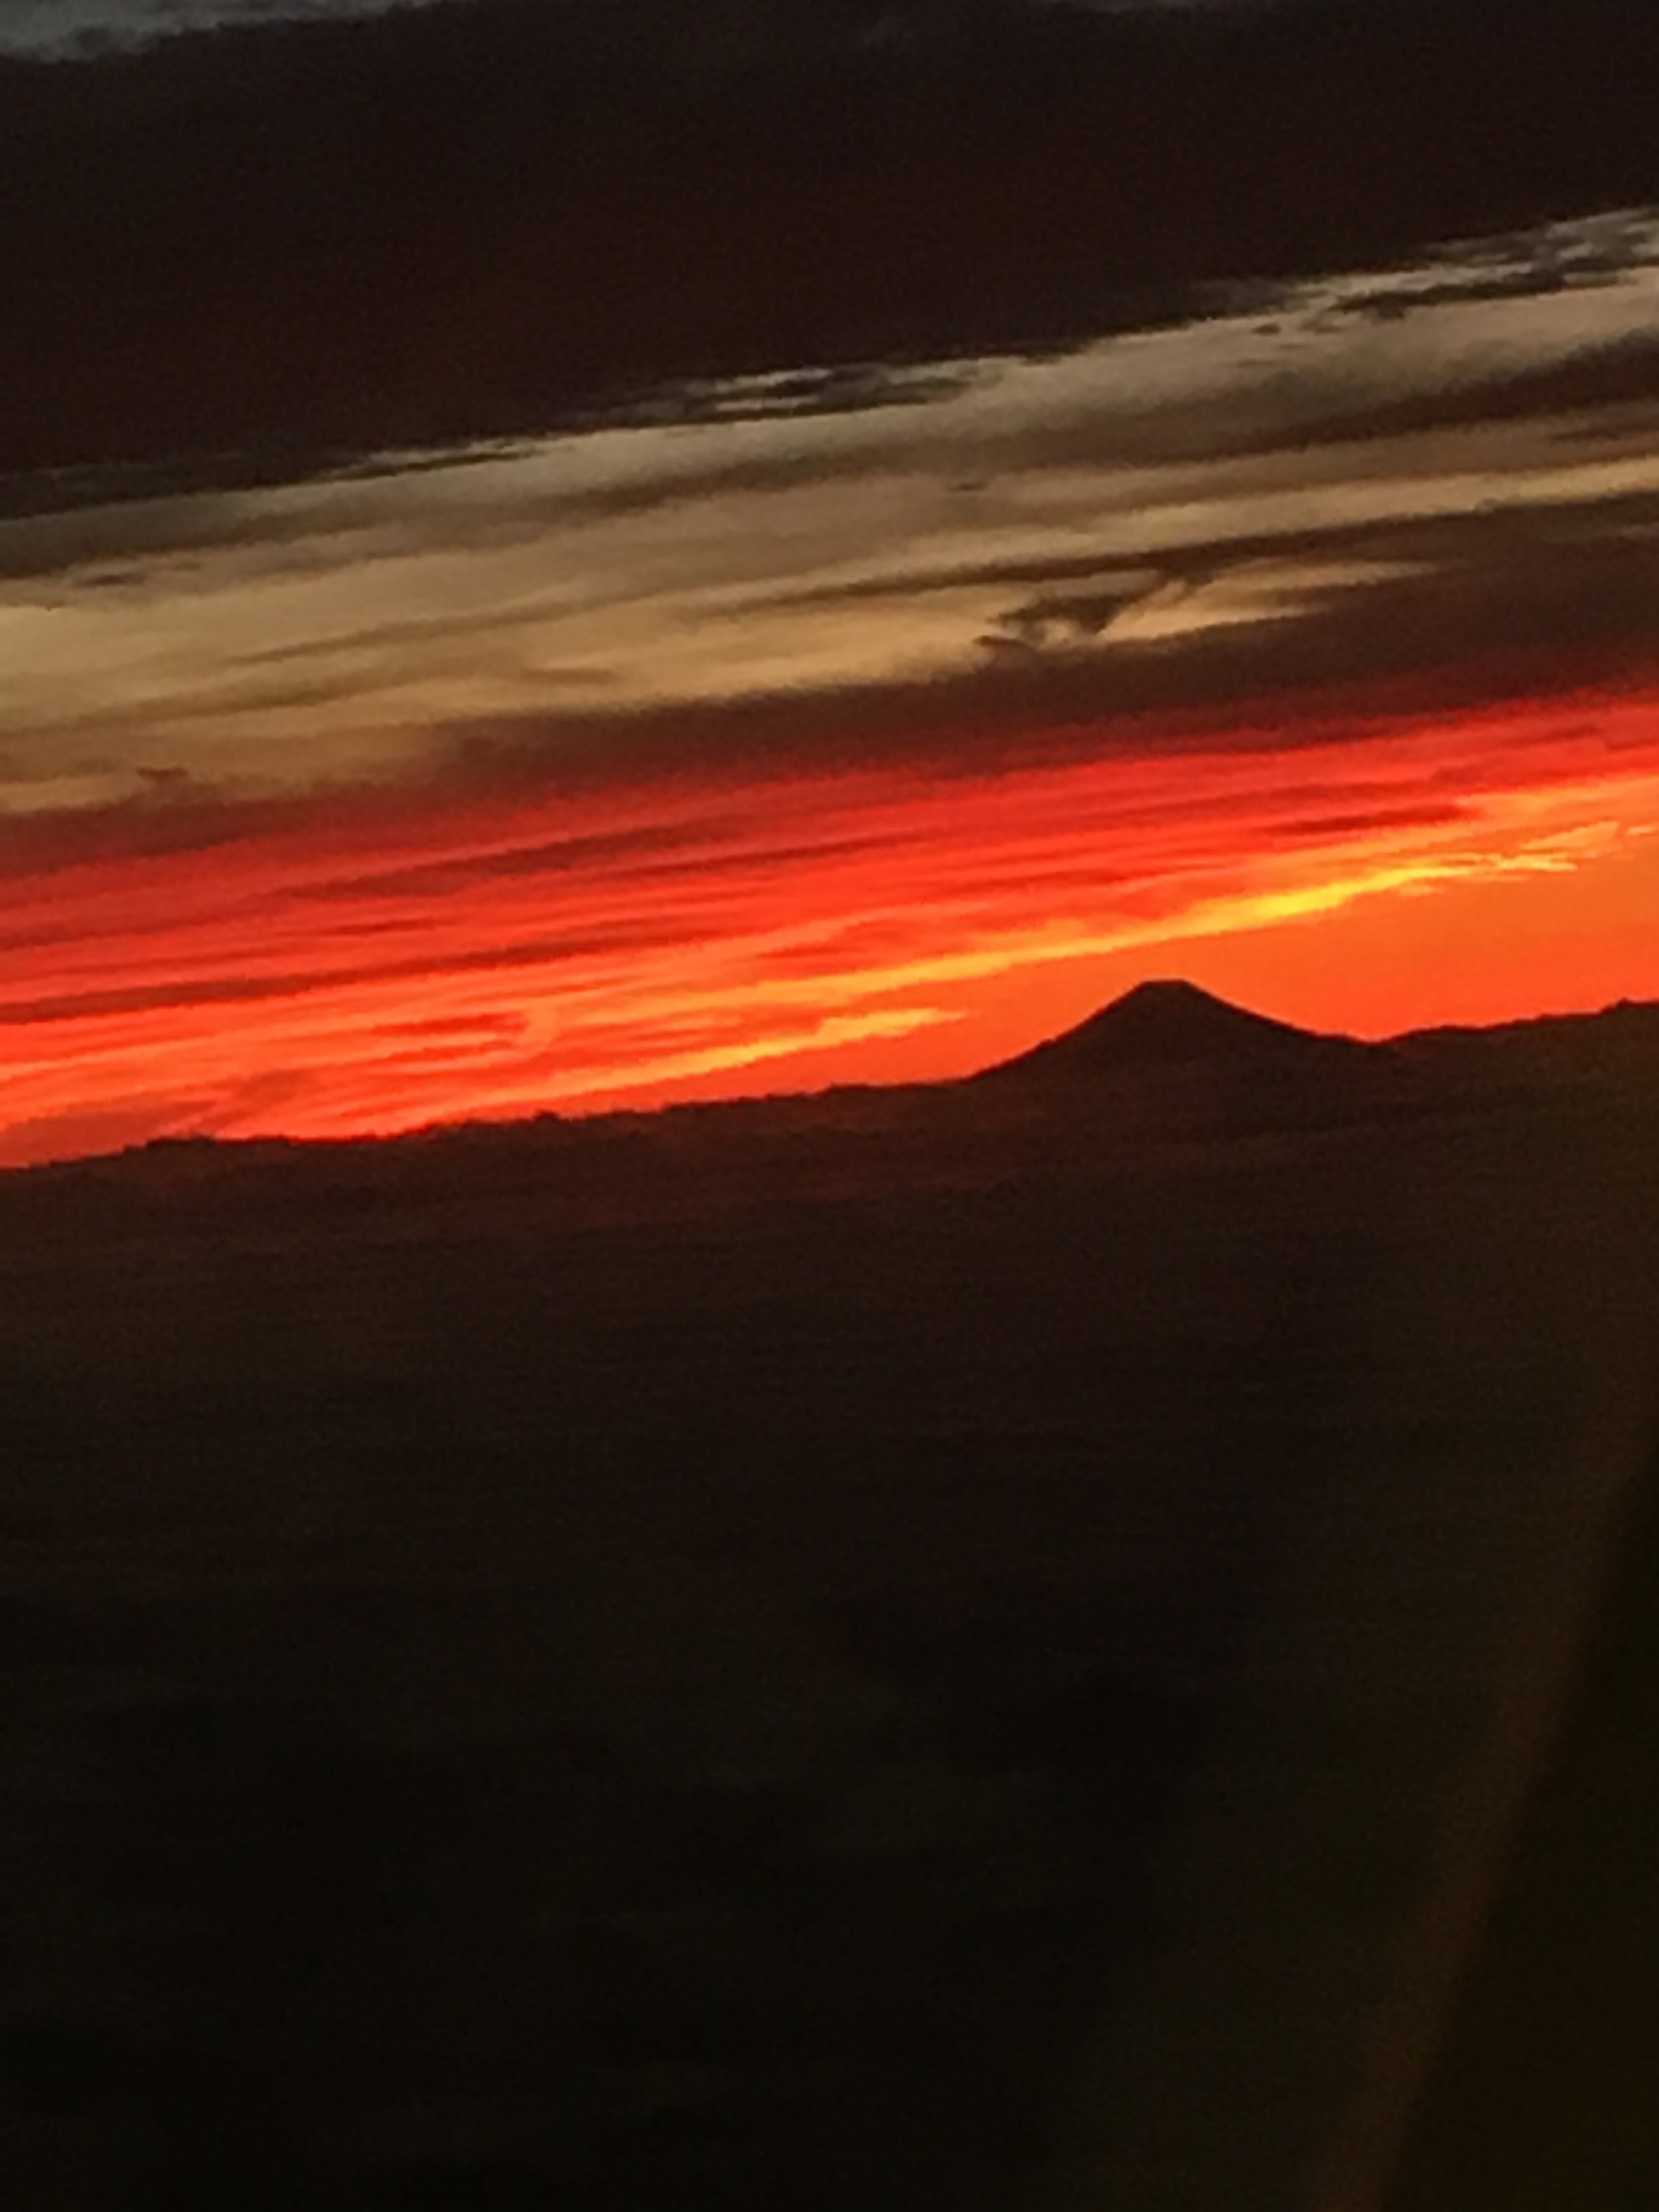 Mt. Fuji upon take-off